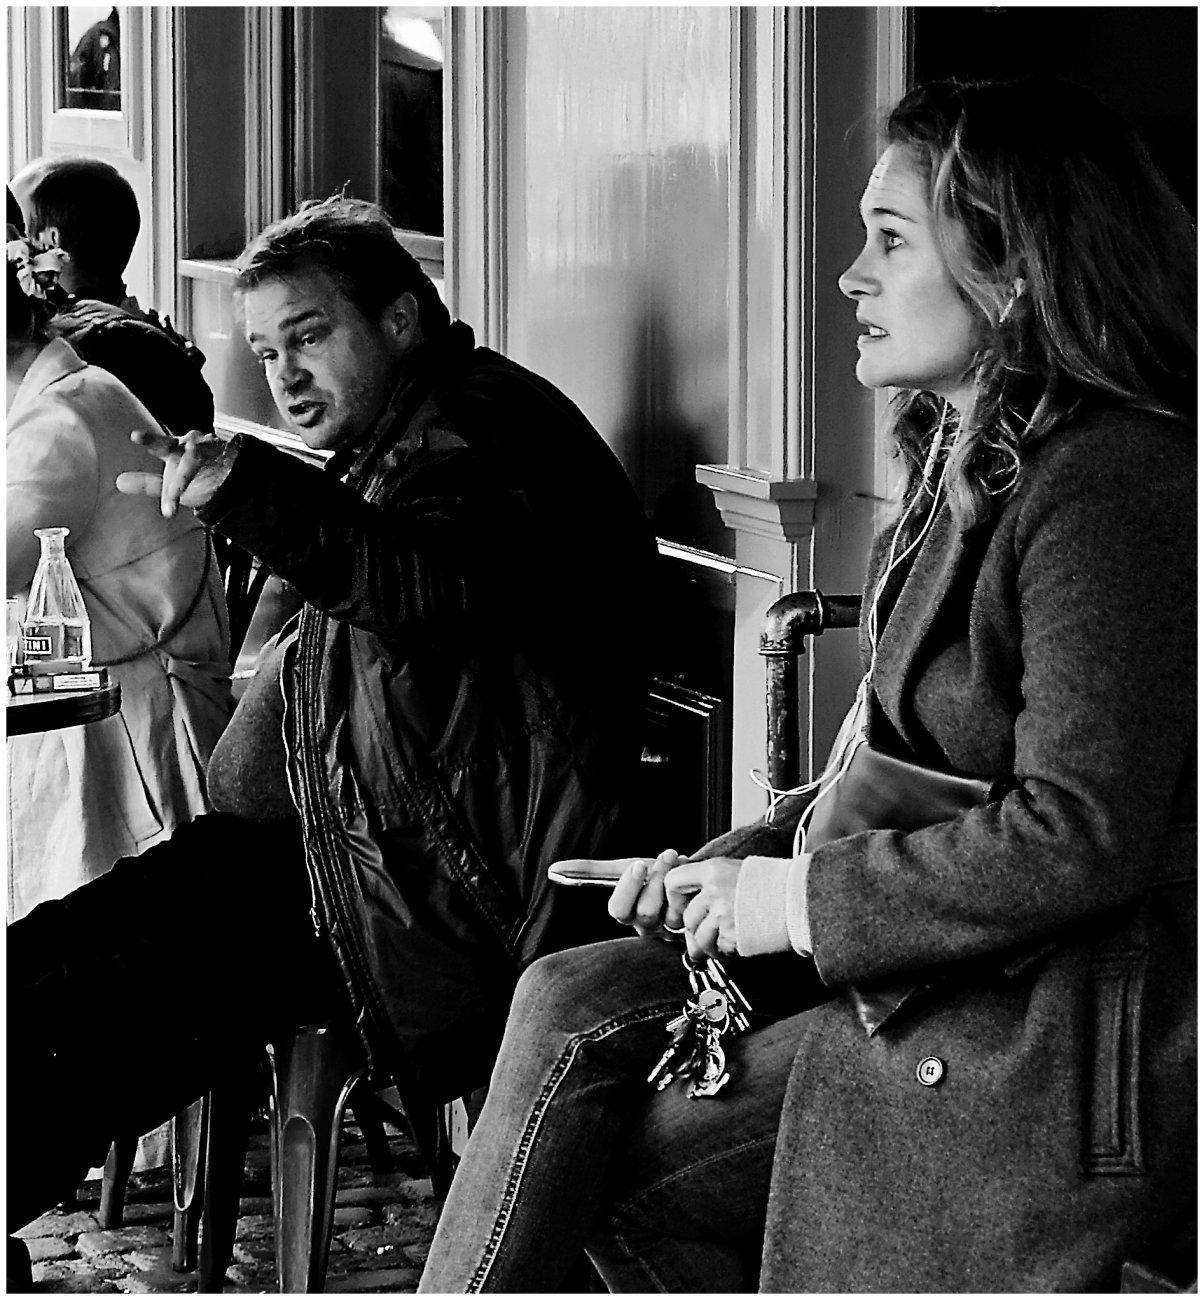 The Copenhagen Cafe